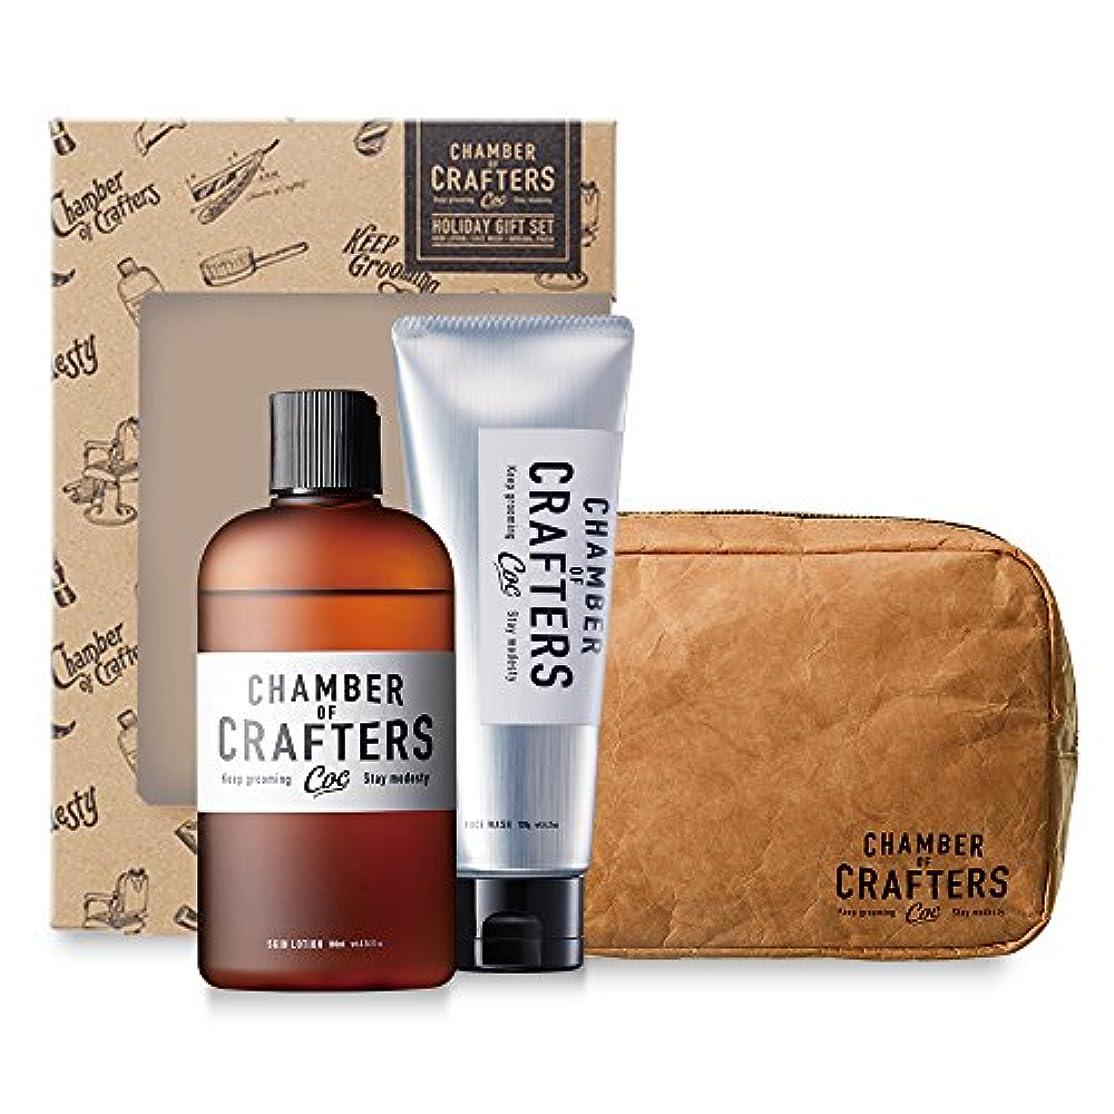 CHAMBER OF CRAFTERS ホリデーギフトセット (スキンローション 化粧水 180mL & フェイスウォッシュ 洗顔料 120g & オリジナルポーチ)